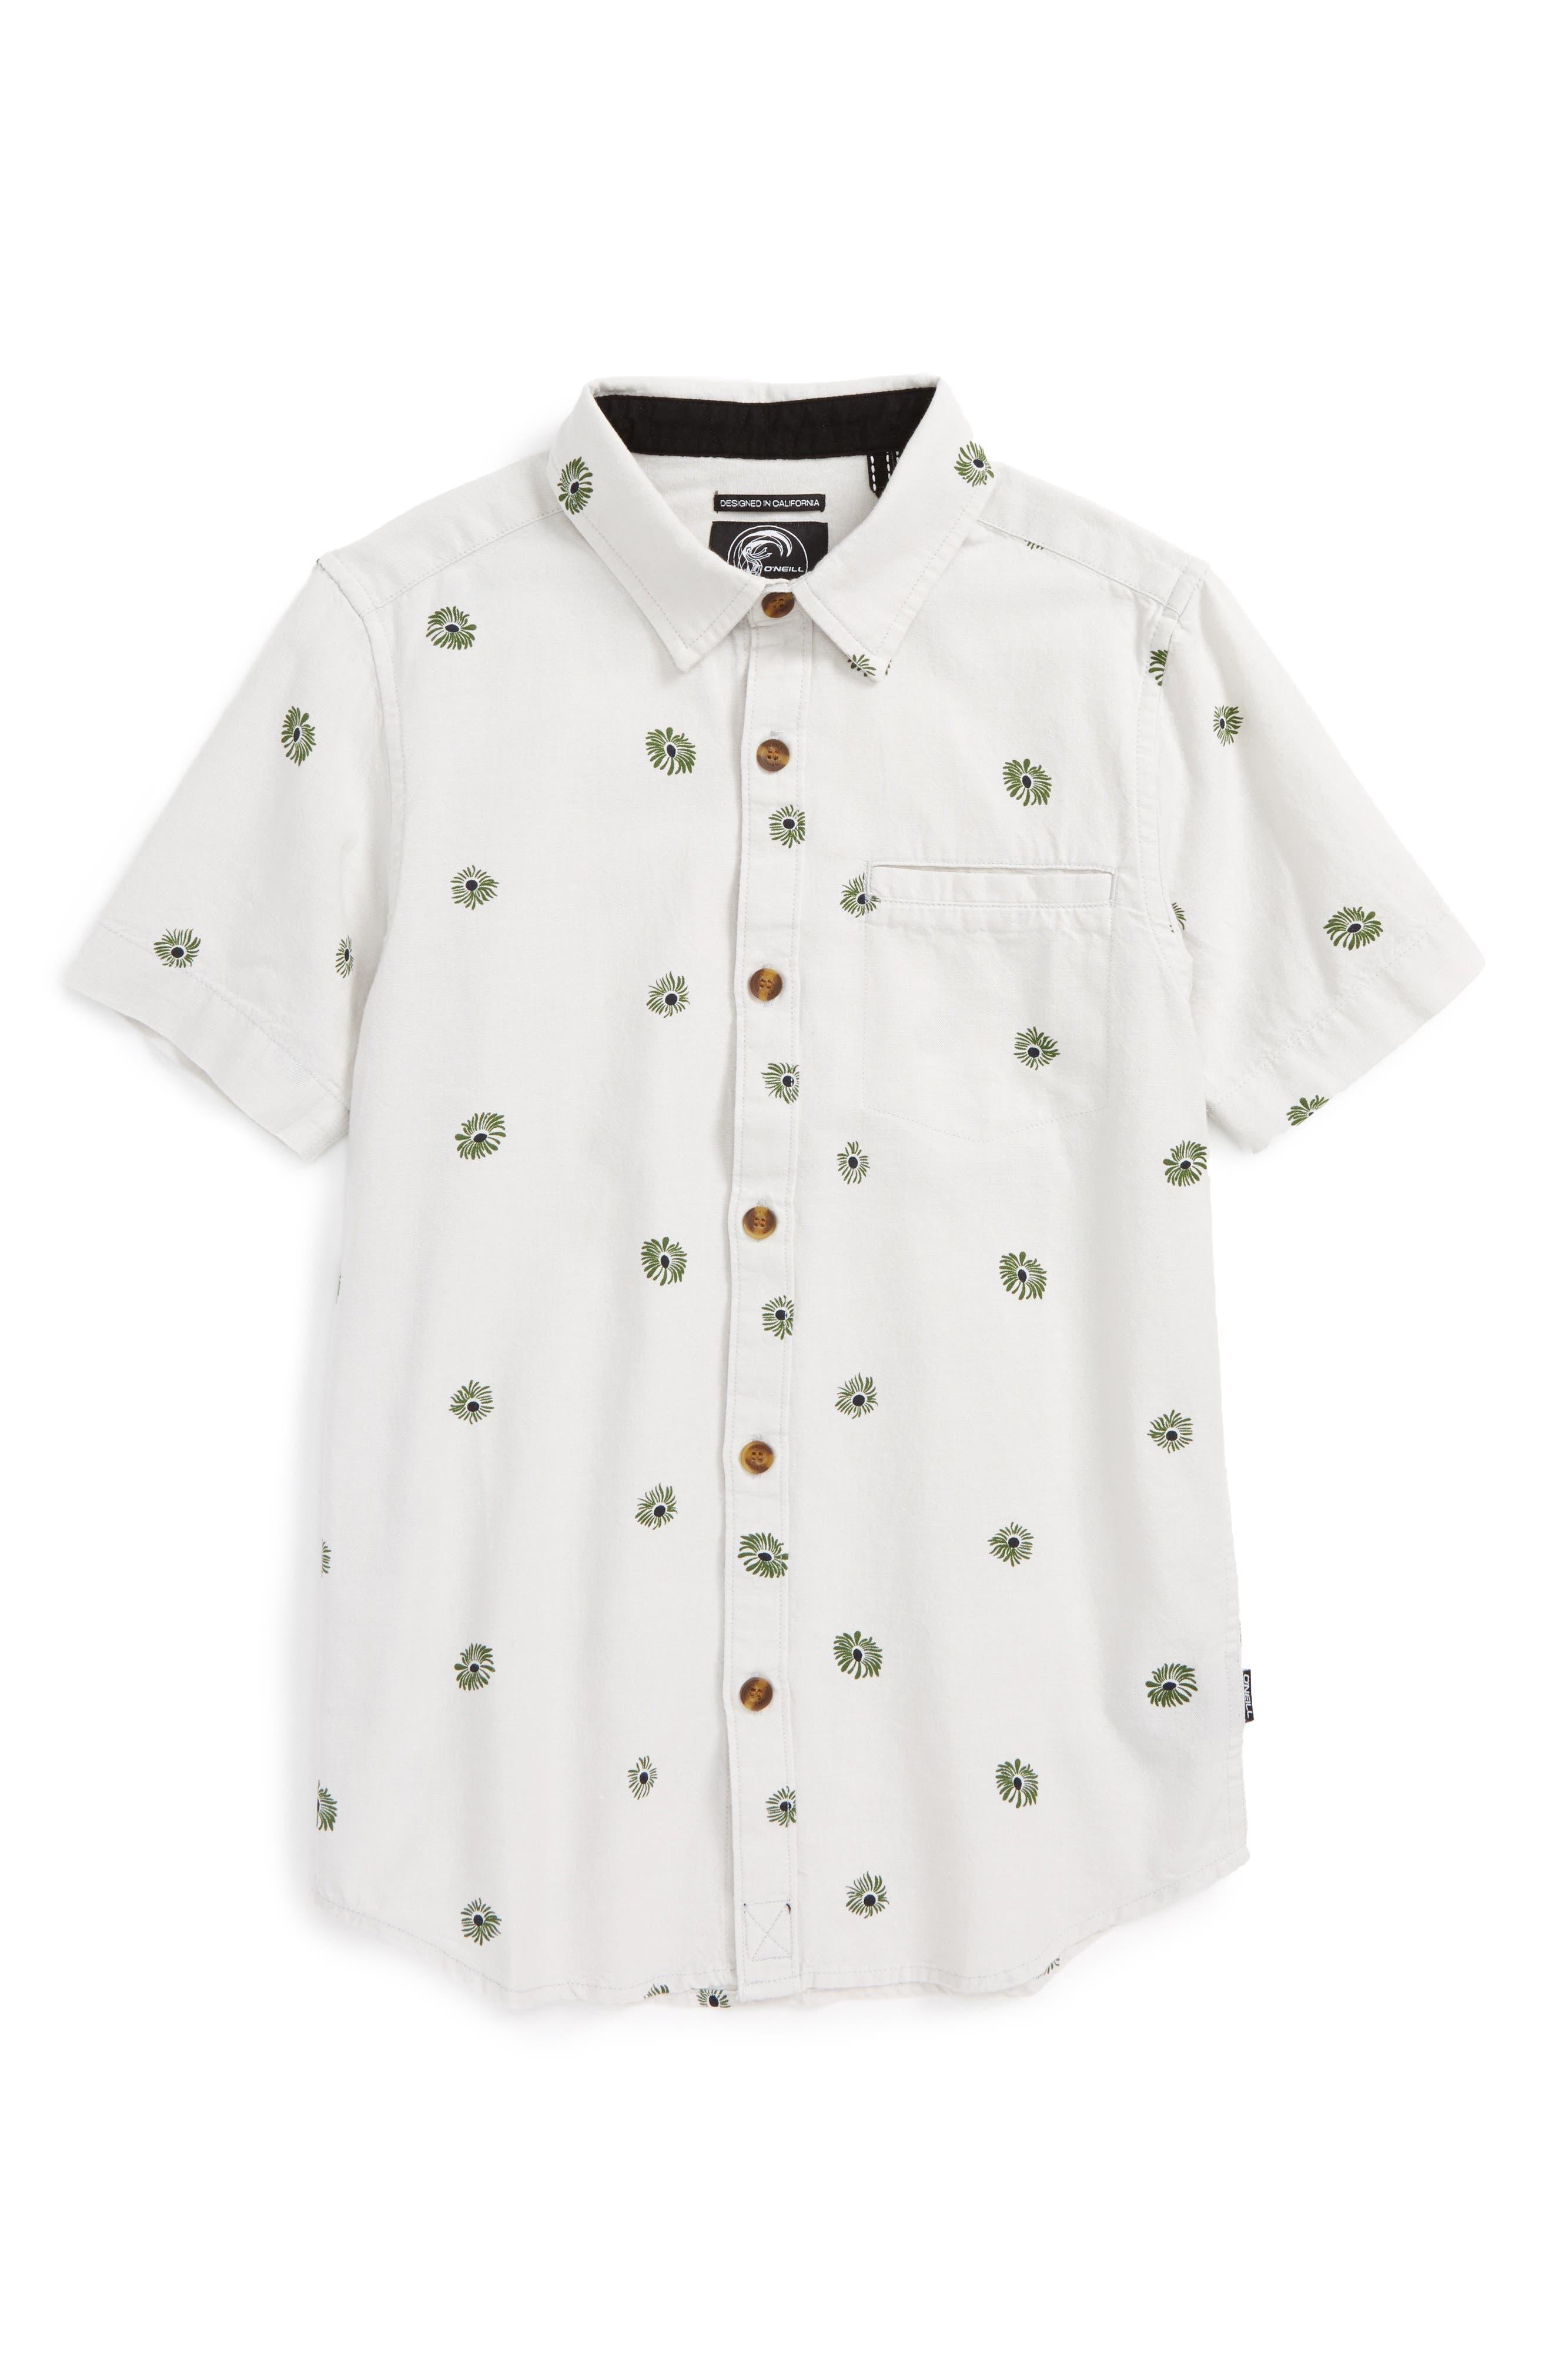 Main Image - O'Neill Brees Floral Print Woven Shirt (Big Boys)